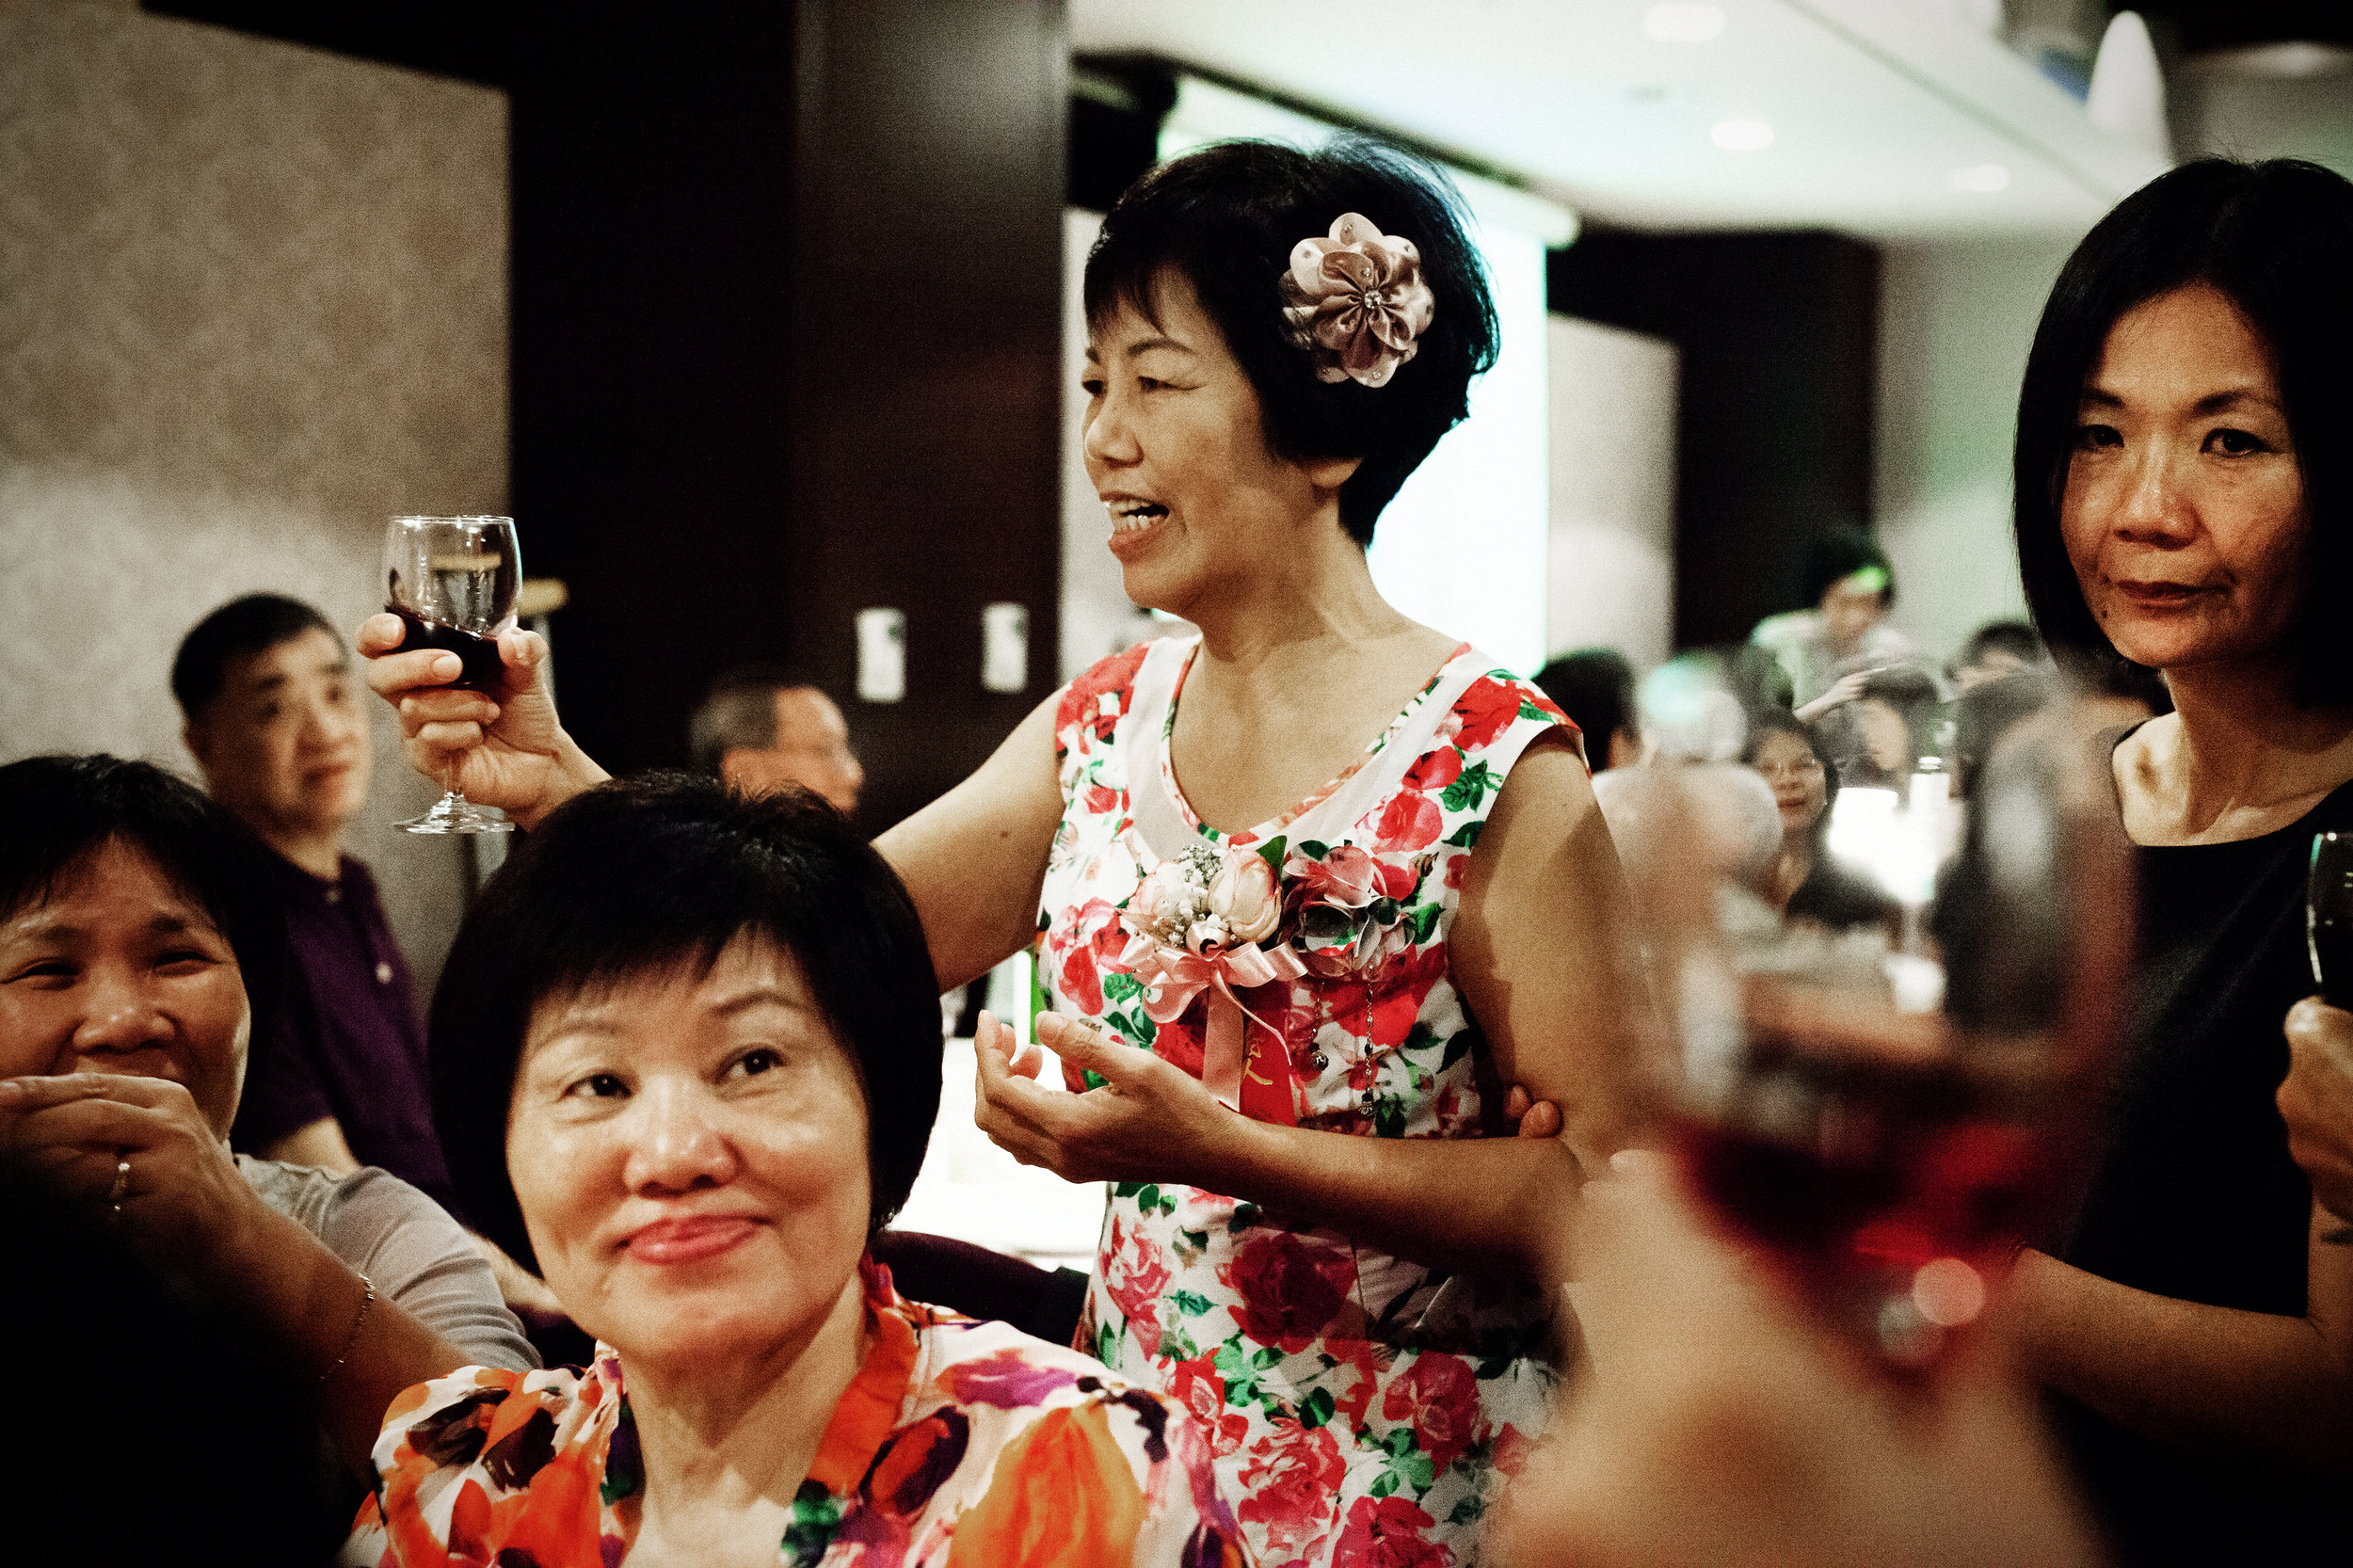 [JC]CREATIVE 女性攝影師 北投儷宴會館 補請台灣WEDDING    自然風格 台北婚攝推 女婚攝  桃園婚攝   圖像00308.JPG